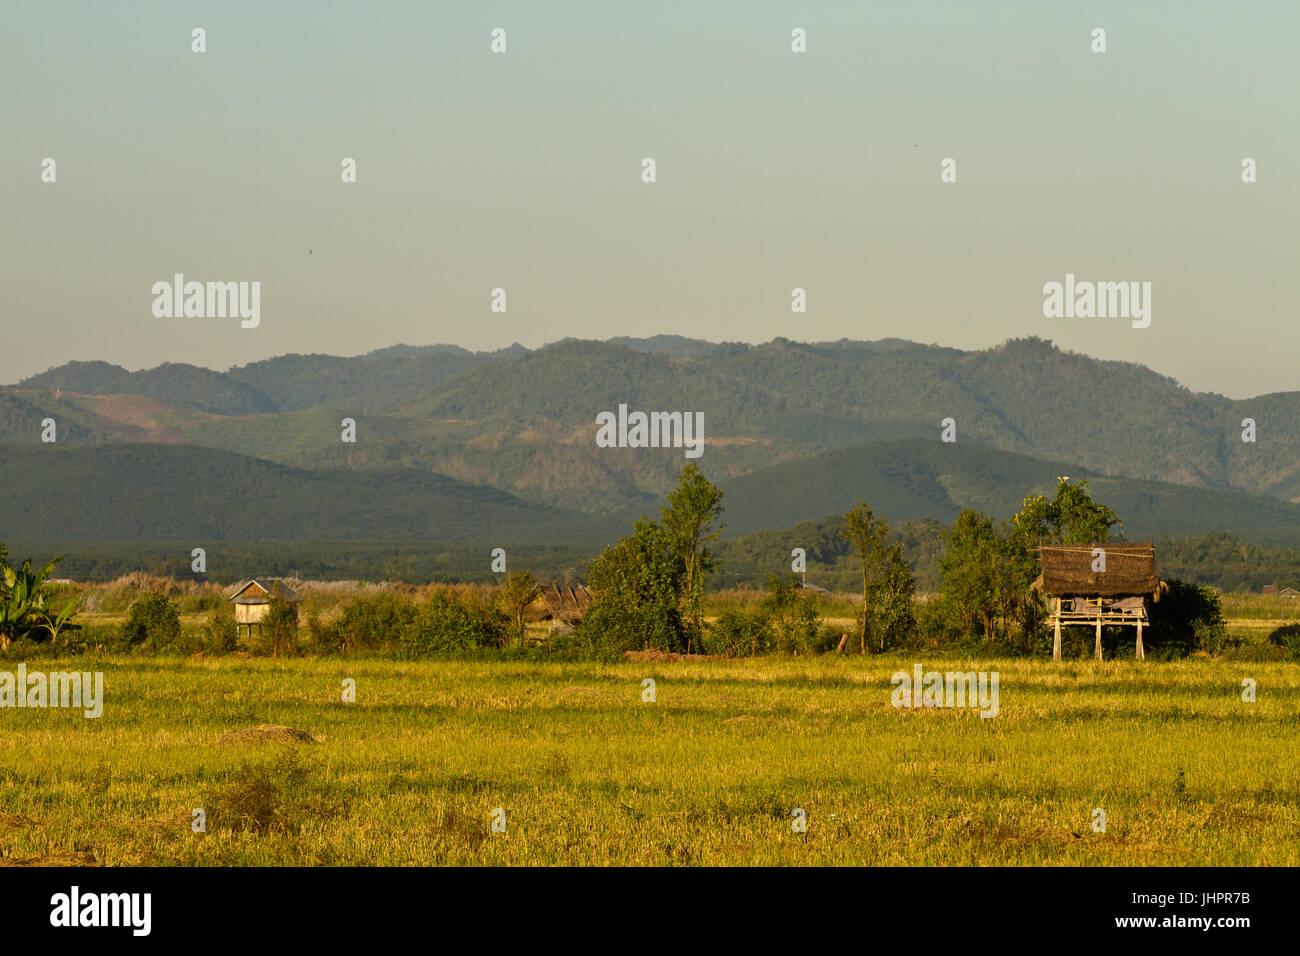 Ubicación de Muang Sing, Laos Imagen De Stock